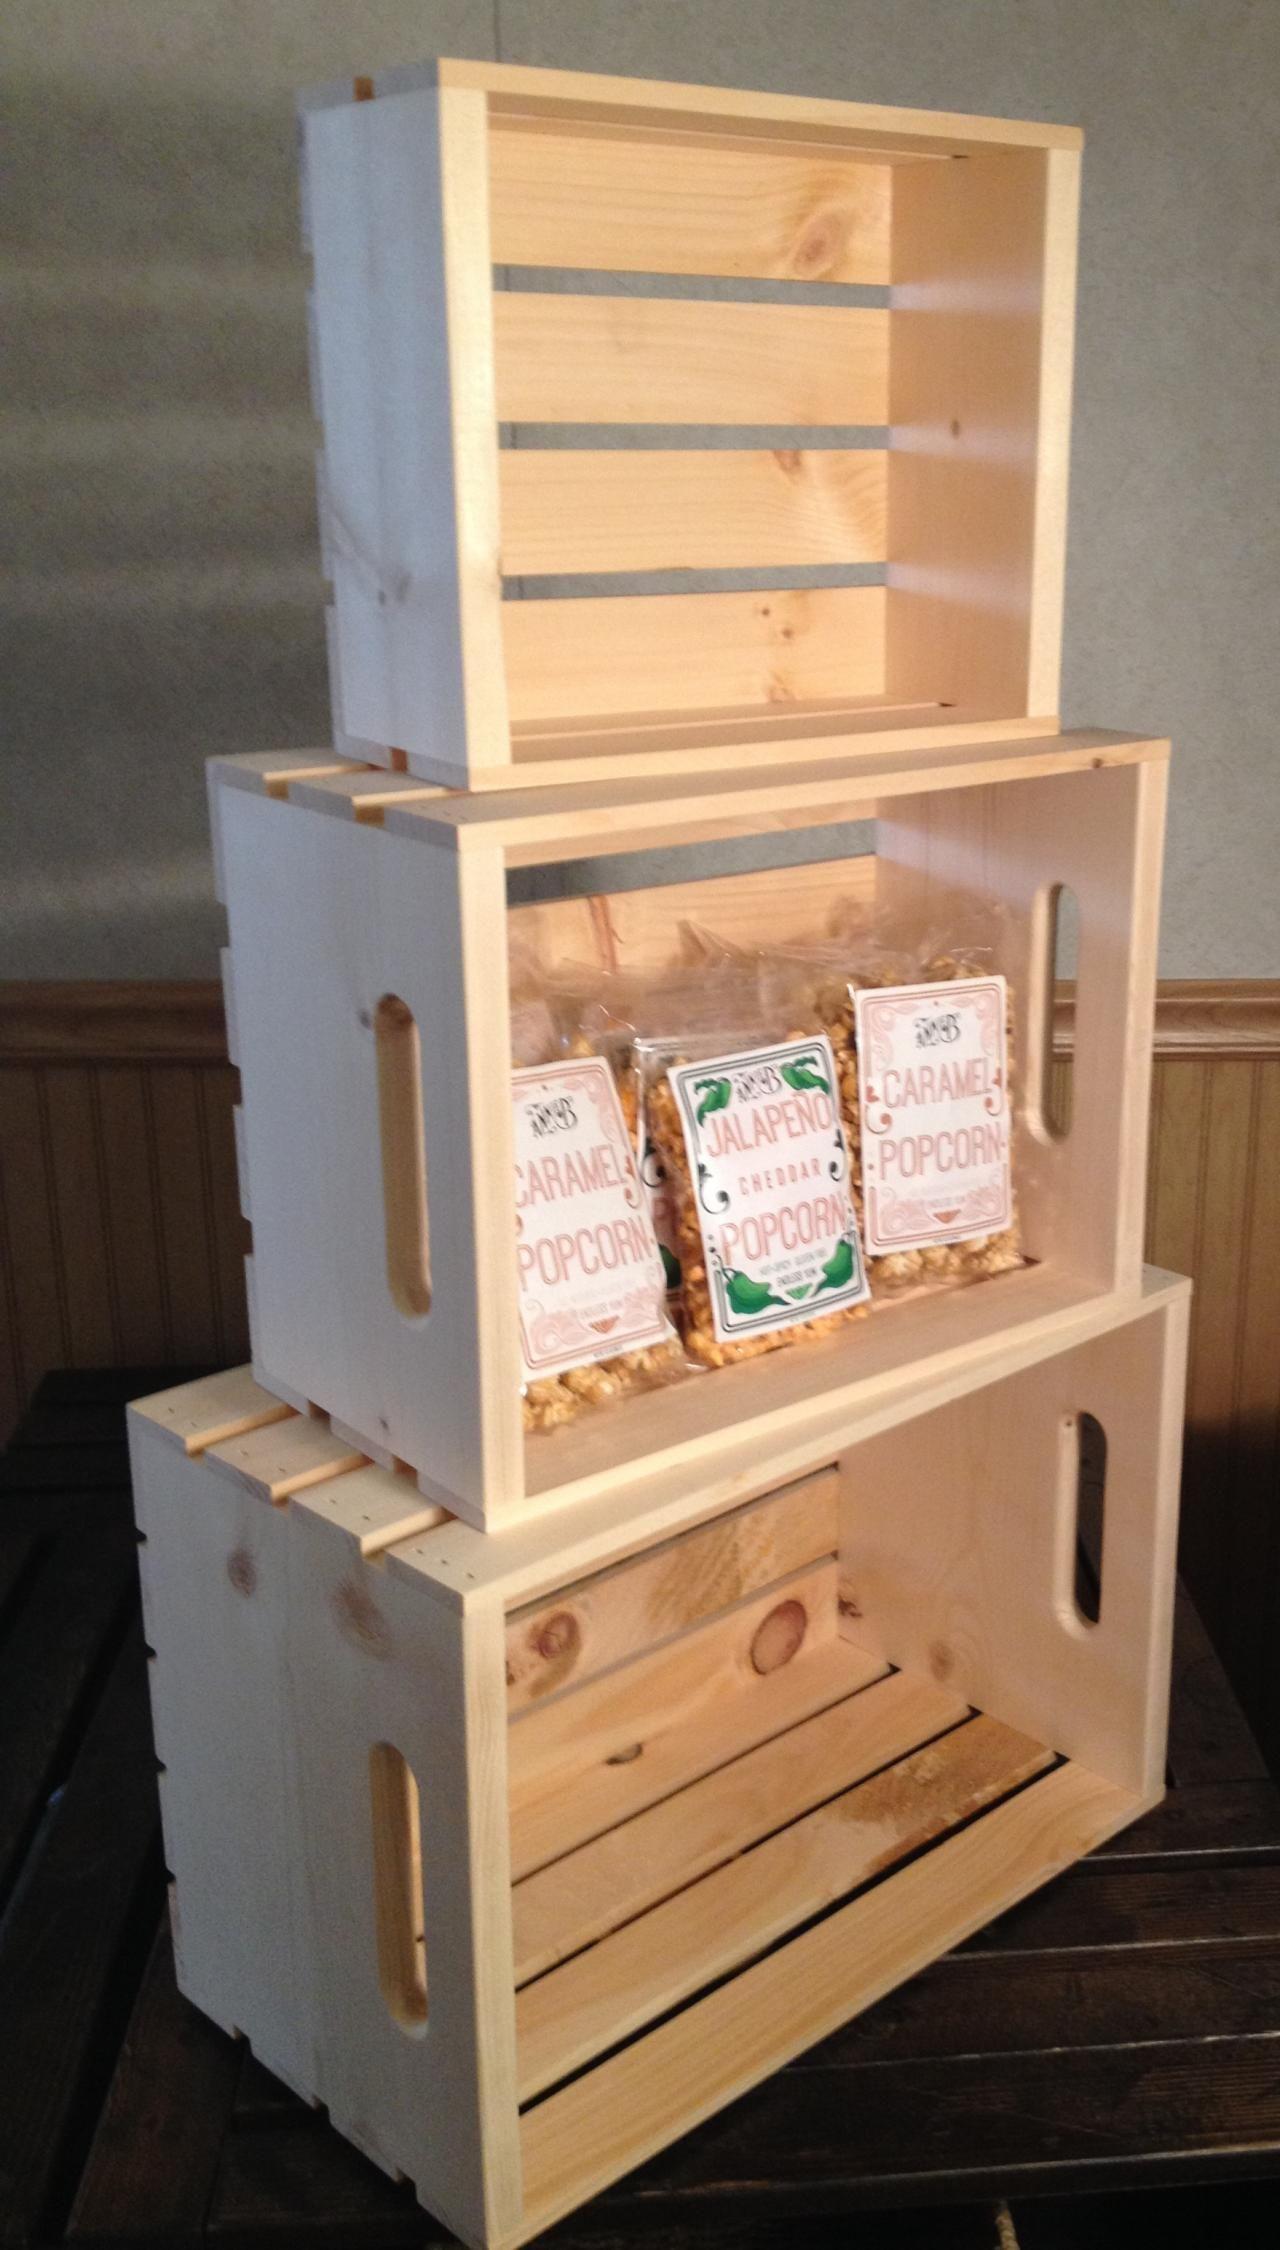 Stacking Crates SET OF 4 Rustic Wood Display Shelf Crates-Retail-Books-Shelves